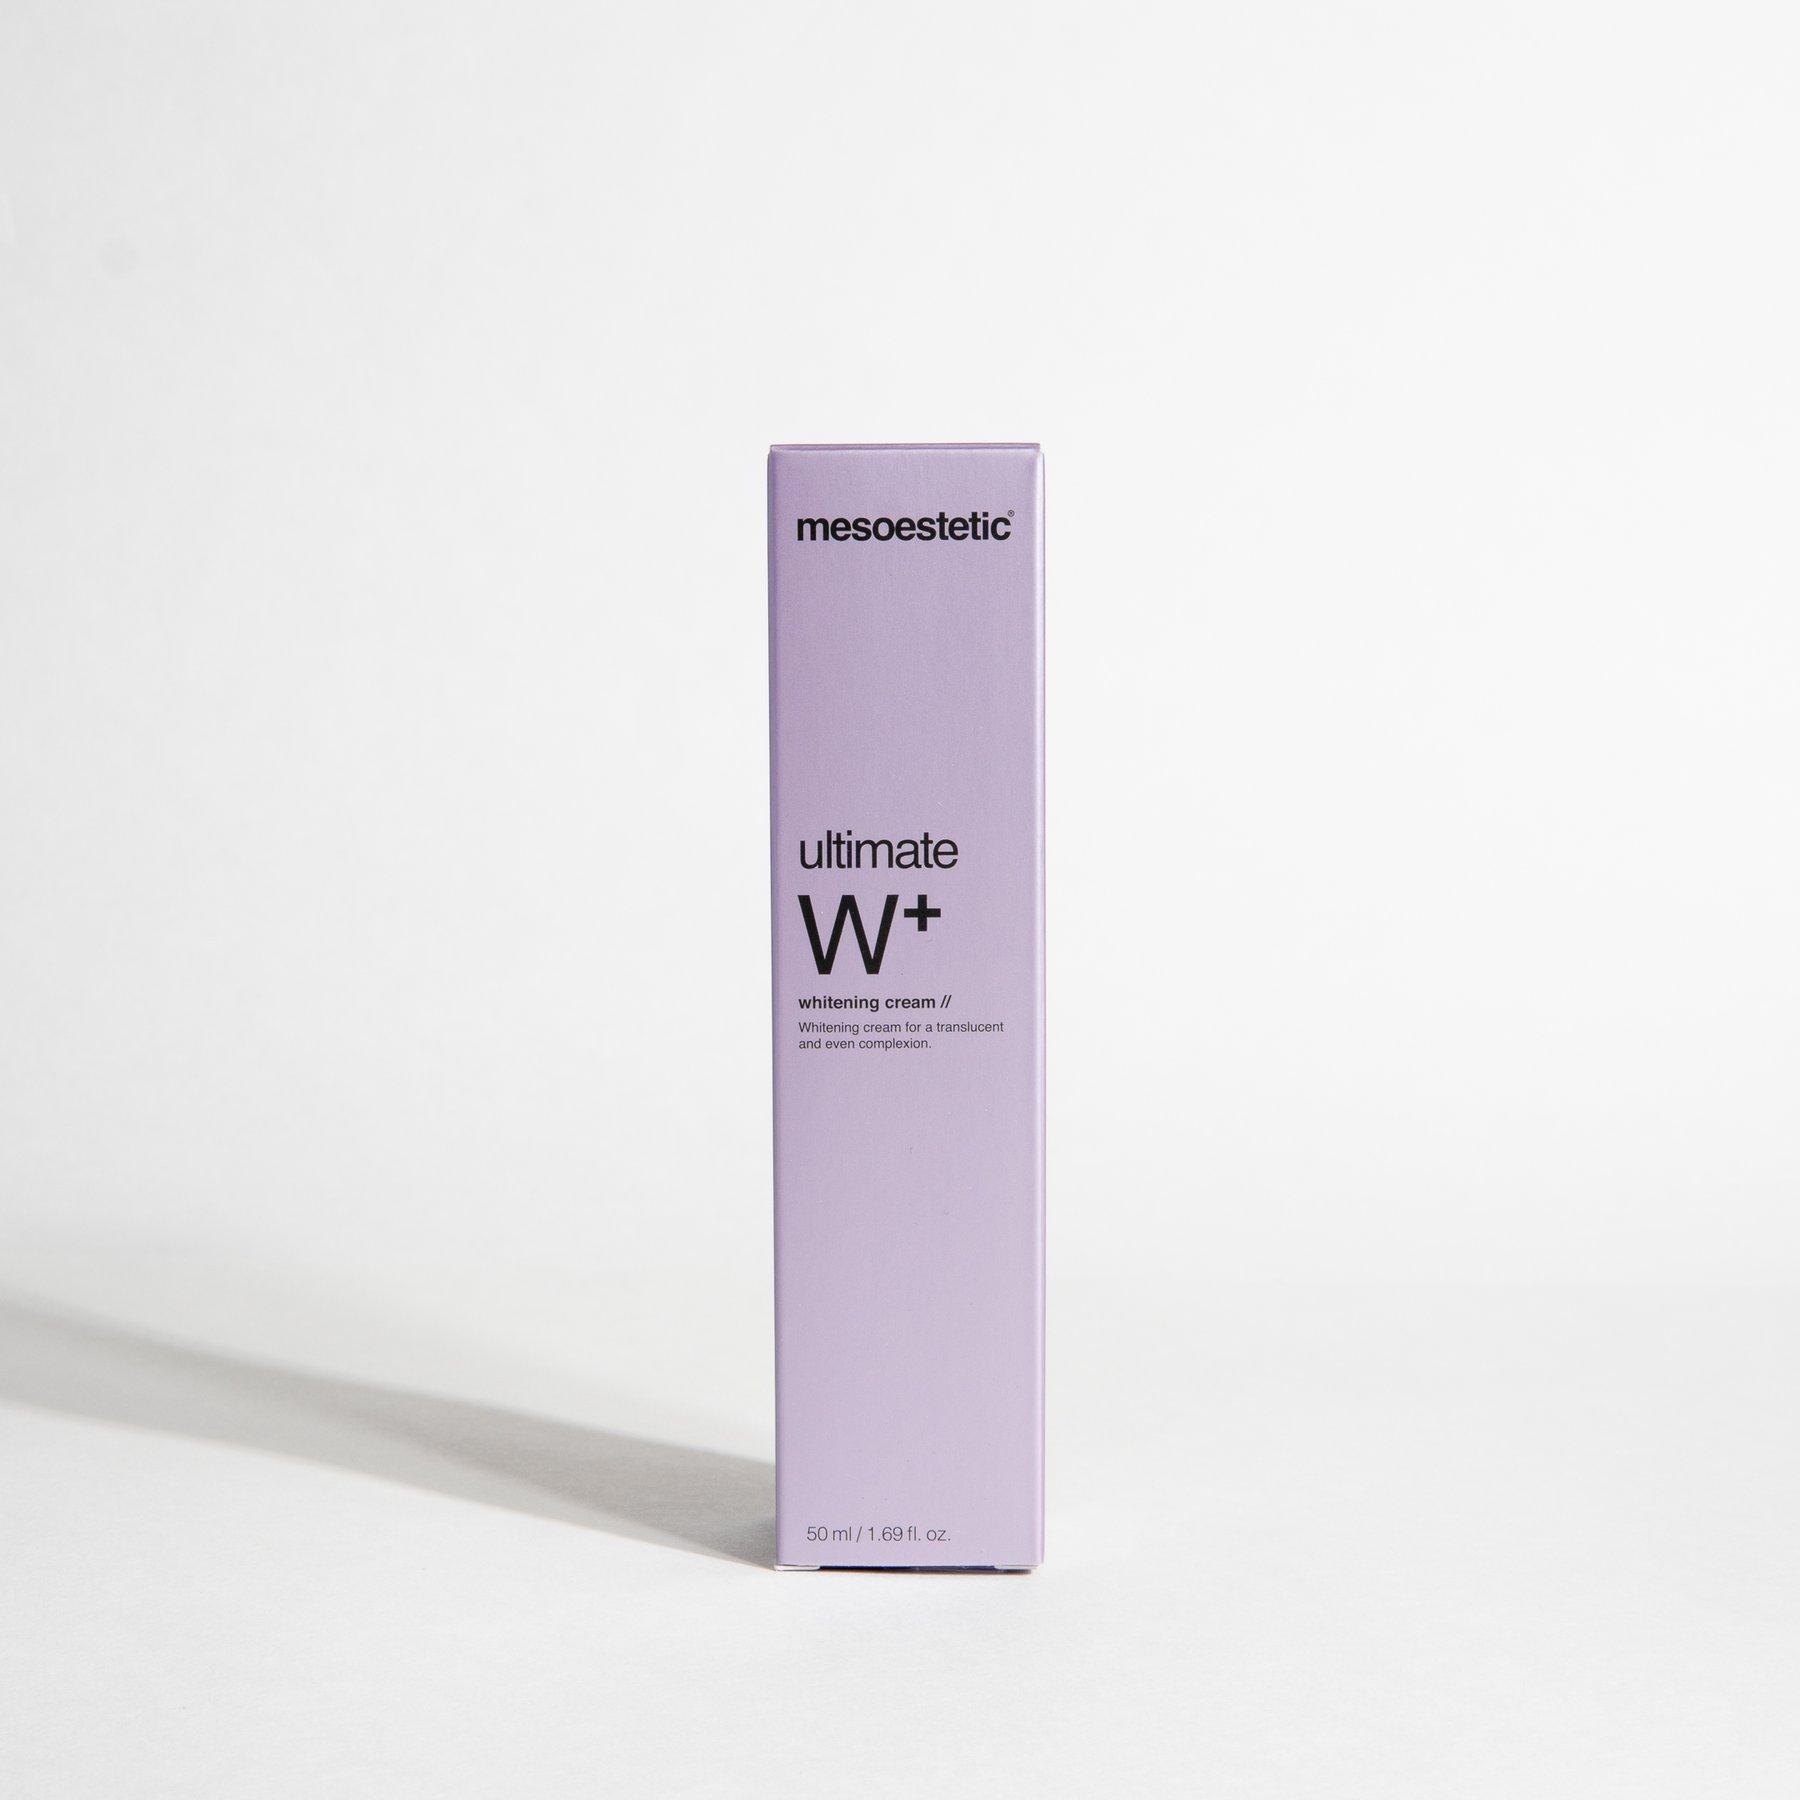 BB Cream Mesoestetic Ultimate W+ SPF 50 Medium 50ML